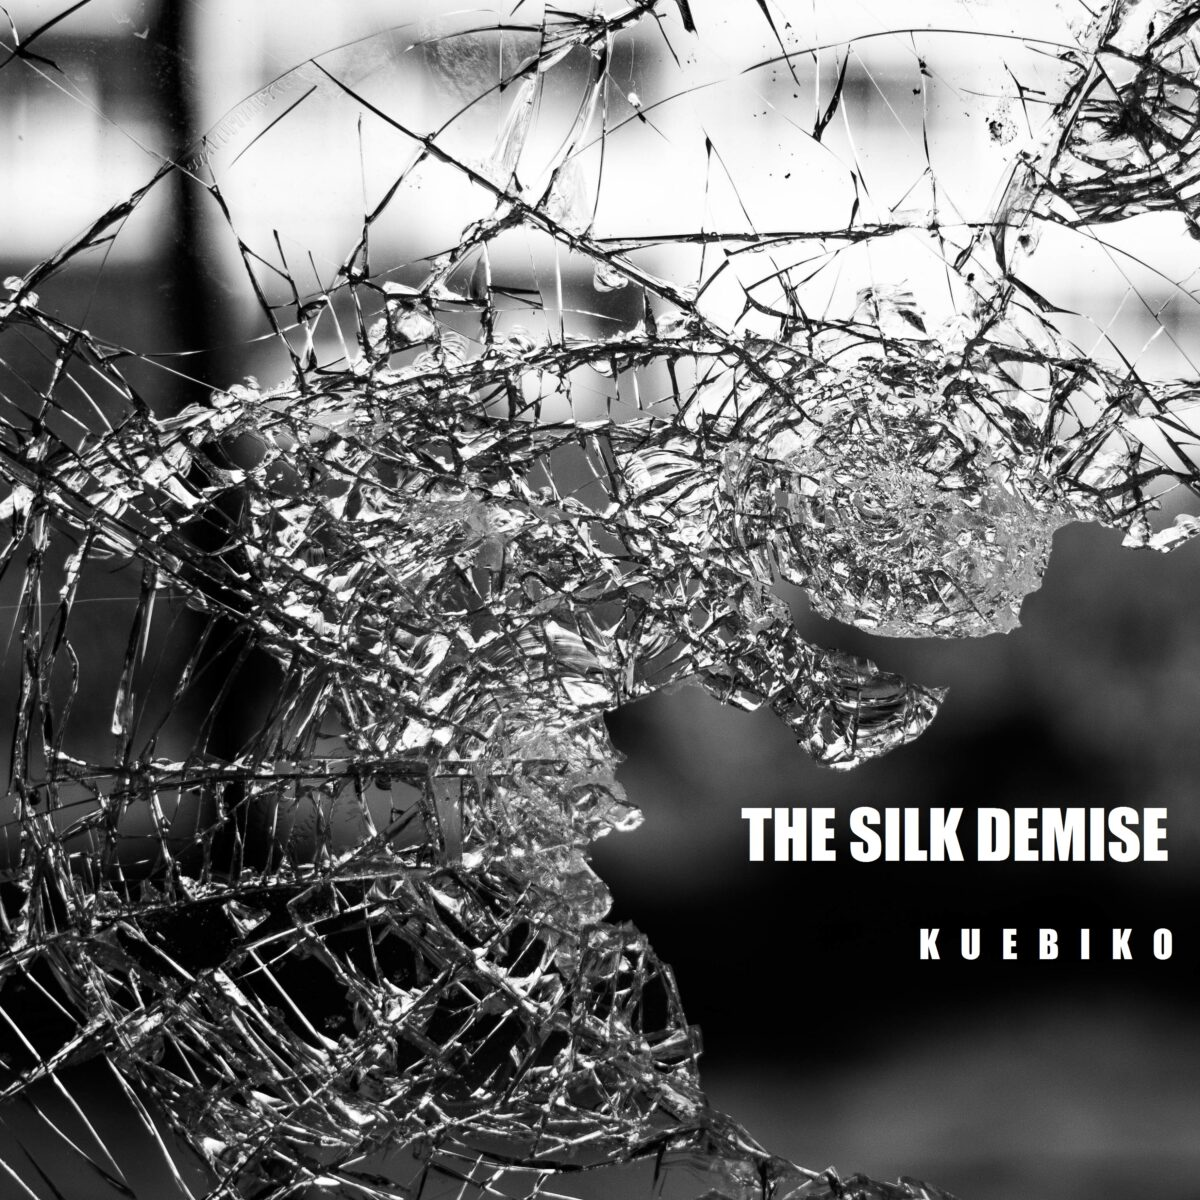 The Silk Demise - Kuebiko